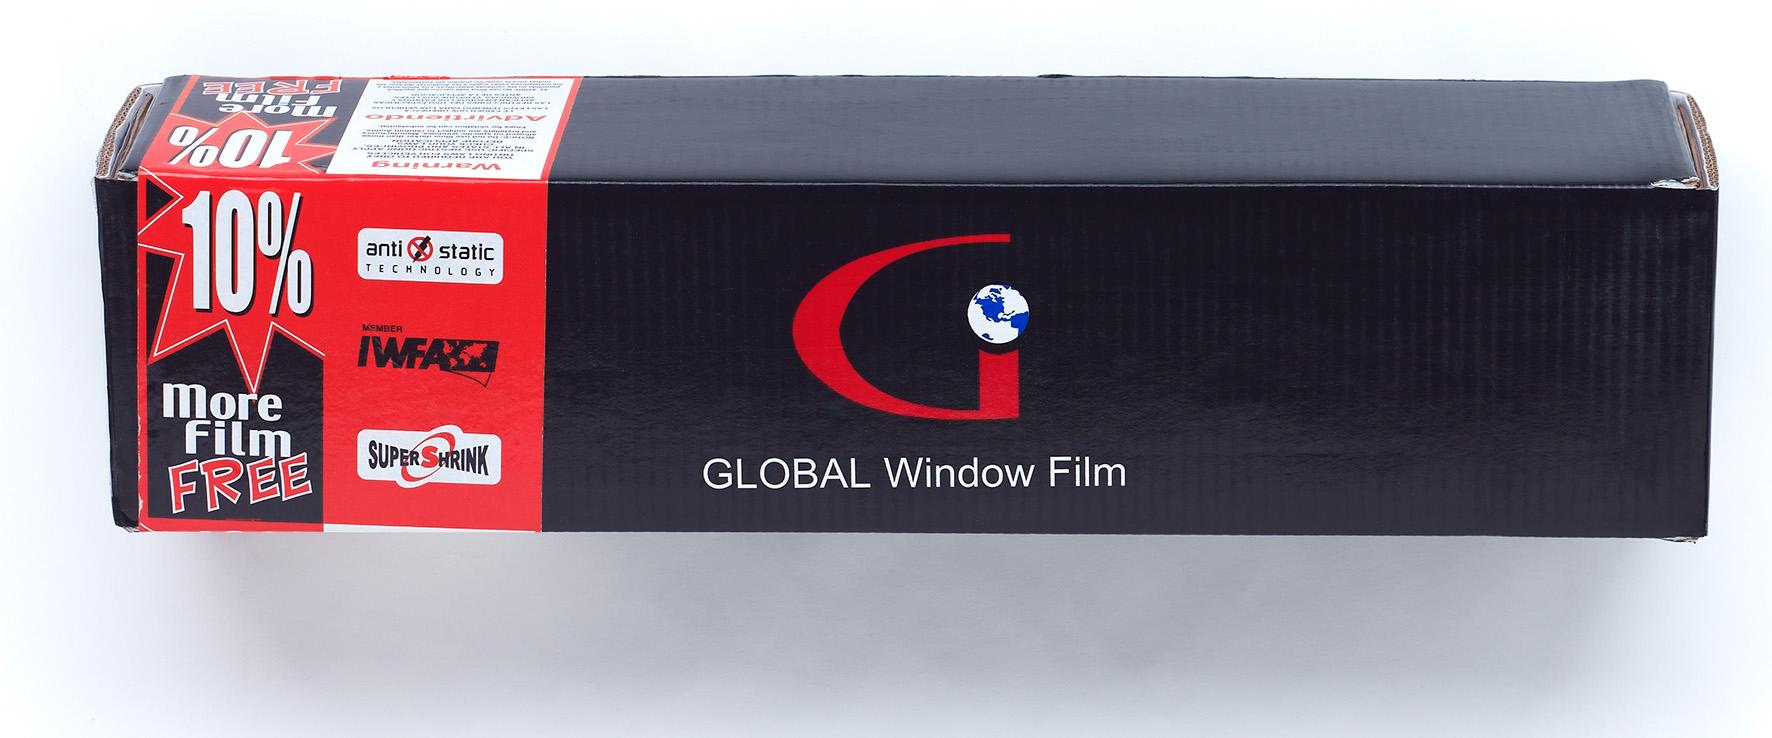 Film Box 2